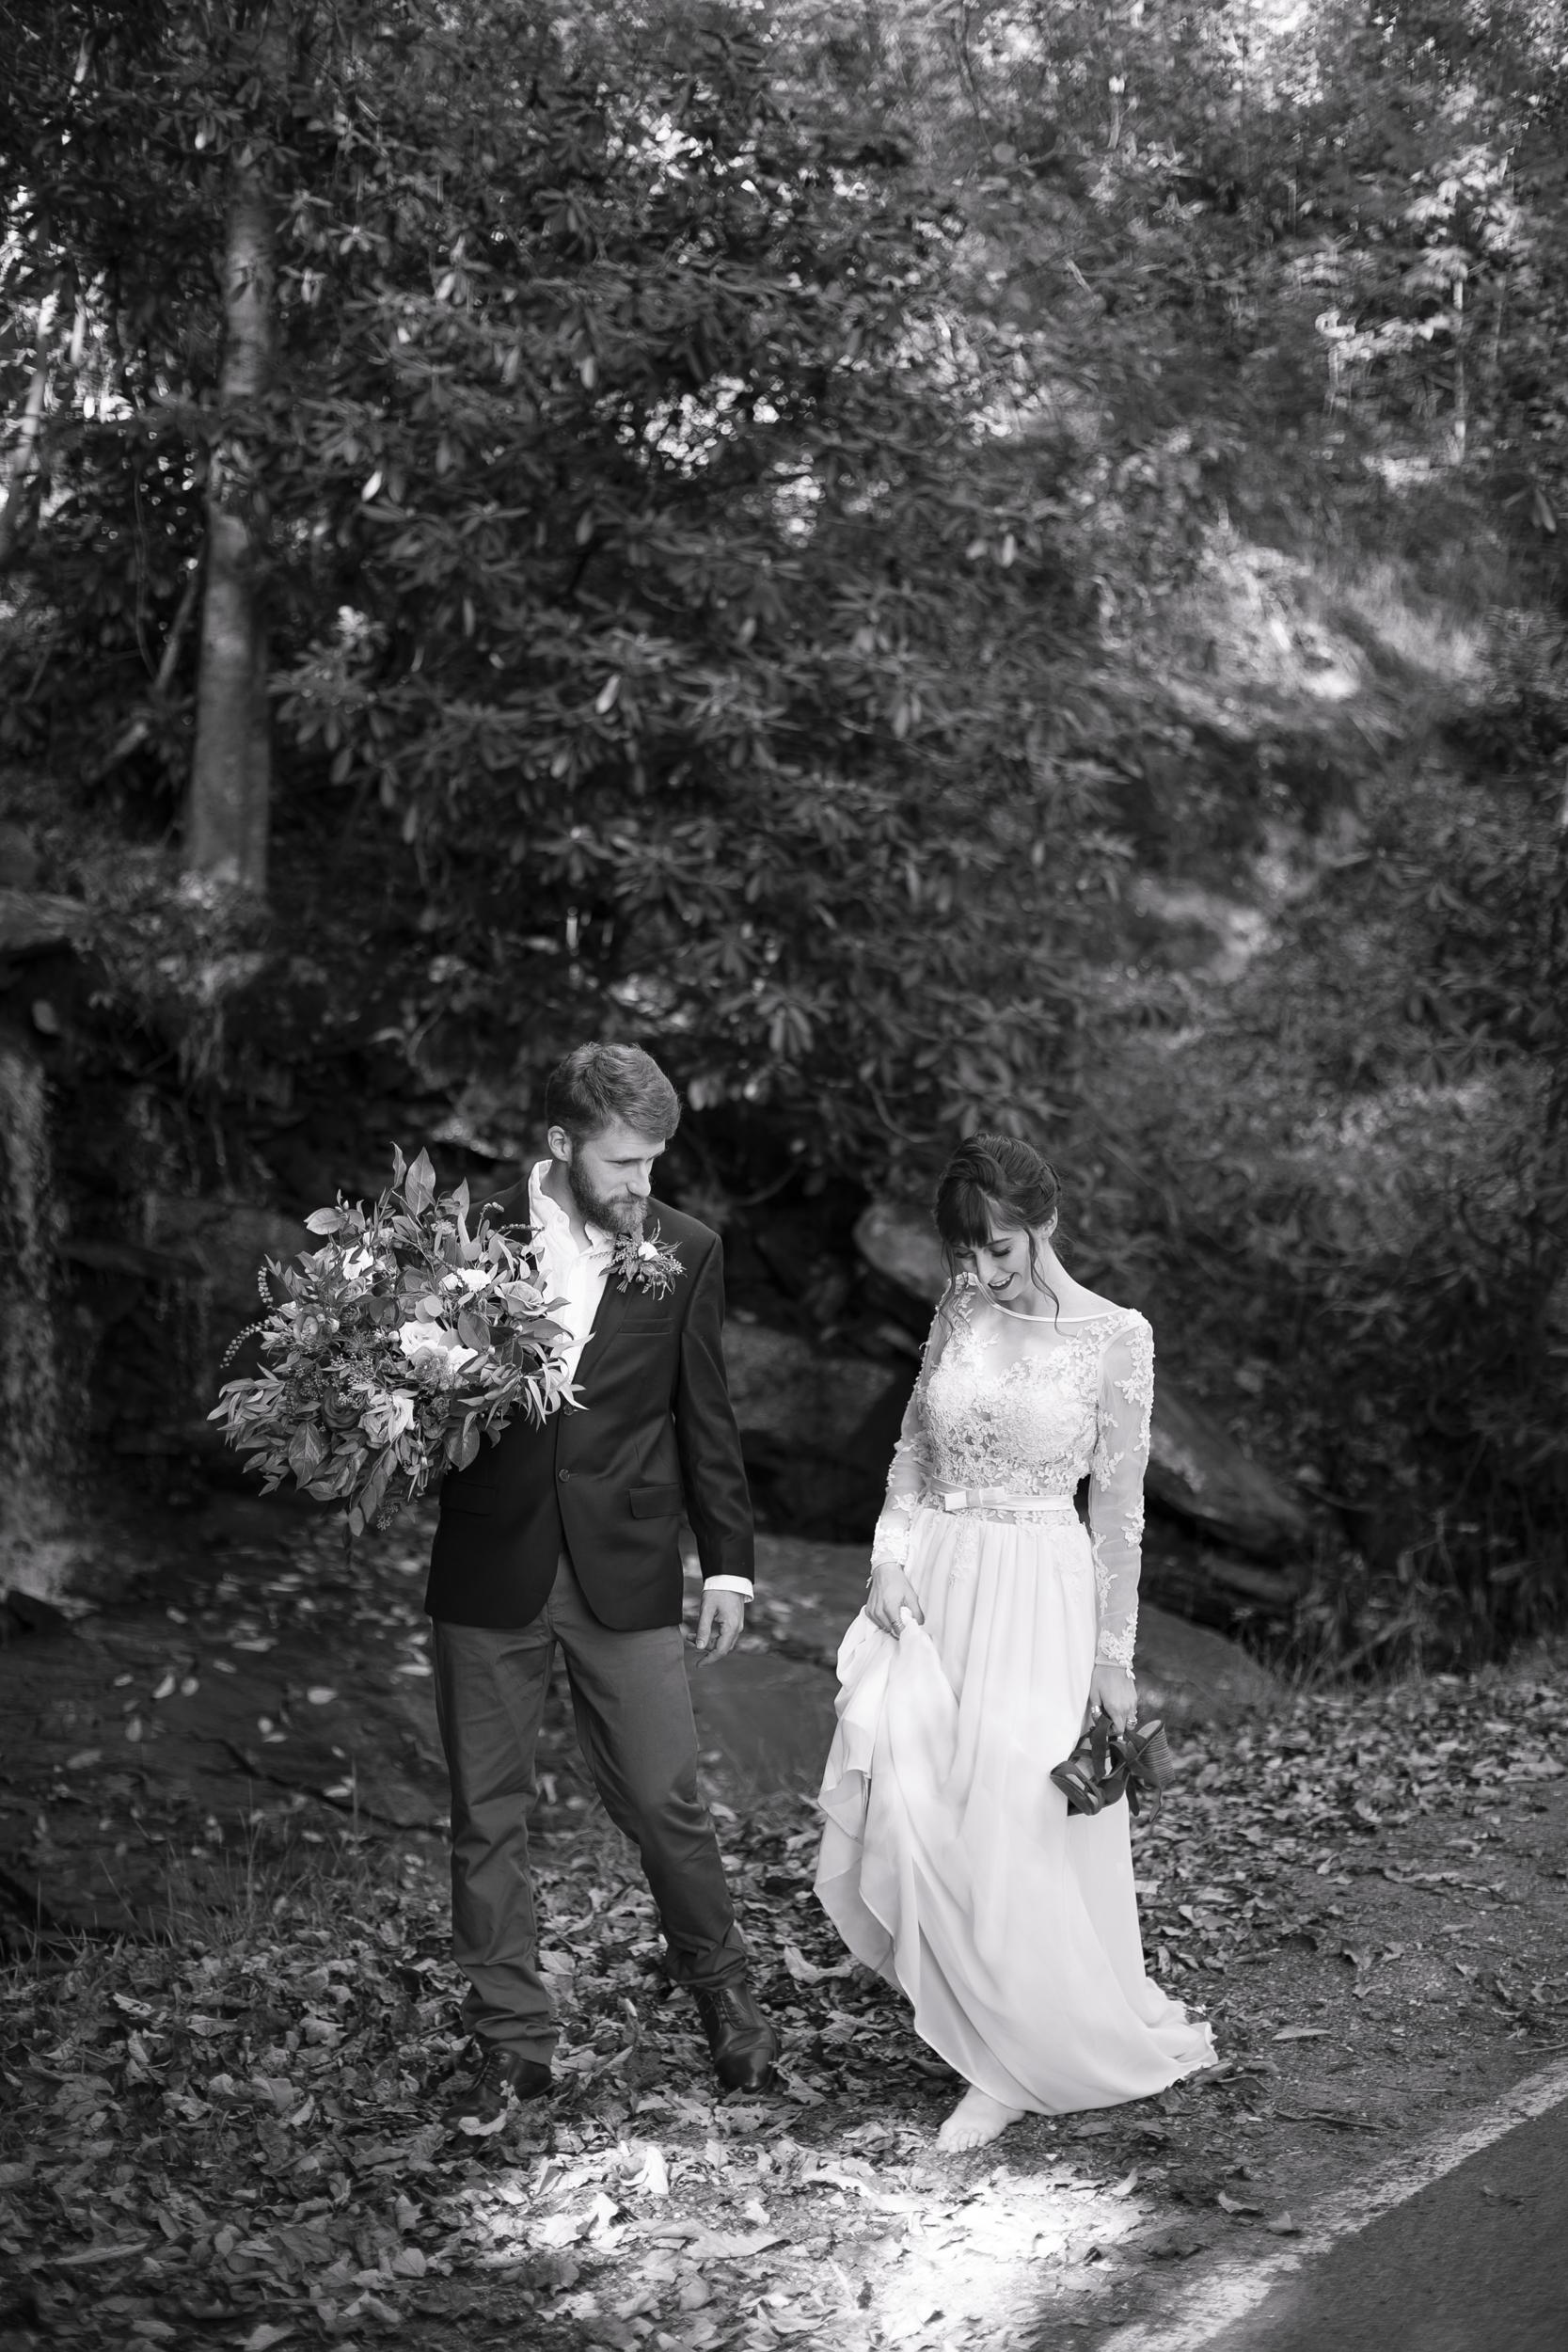 Laurel Falls Wedding October 2018_Allison and Josh__Lola Salon_Flora_Photo by Studio Misha Photography-118.jpg